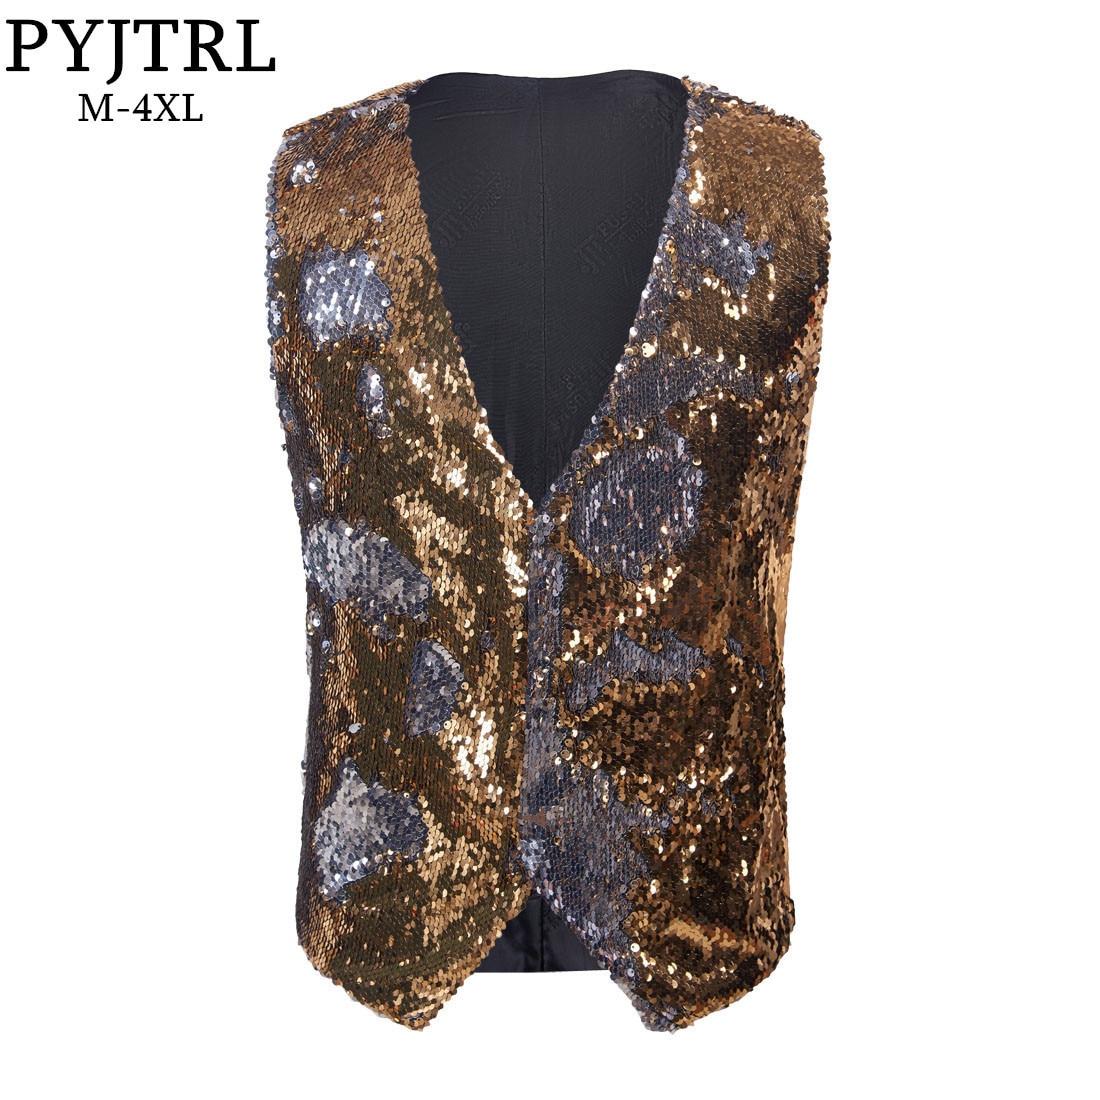 PYJTRL New Mens Stylish Double-sided Sequins Waistcoat Gold Silver Red Purple Blue Black Pink Paillette Vest DJ Singers Costume